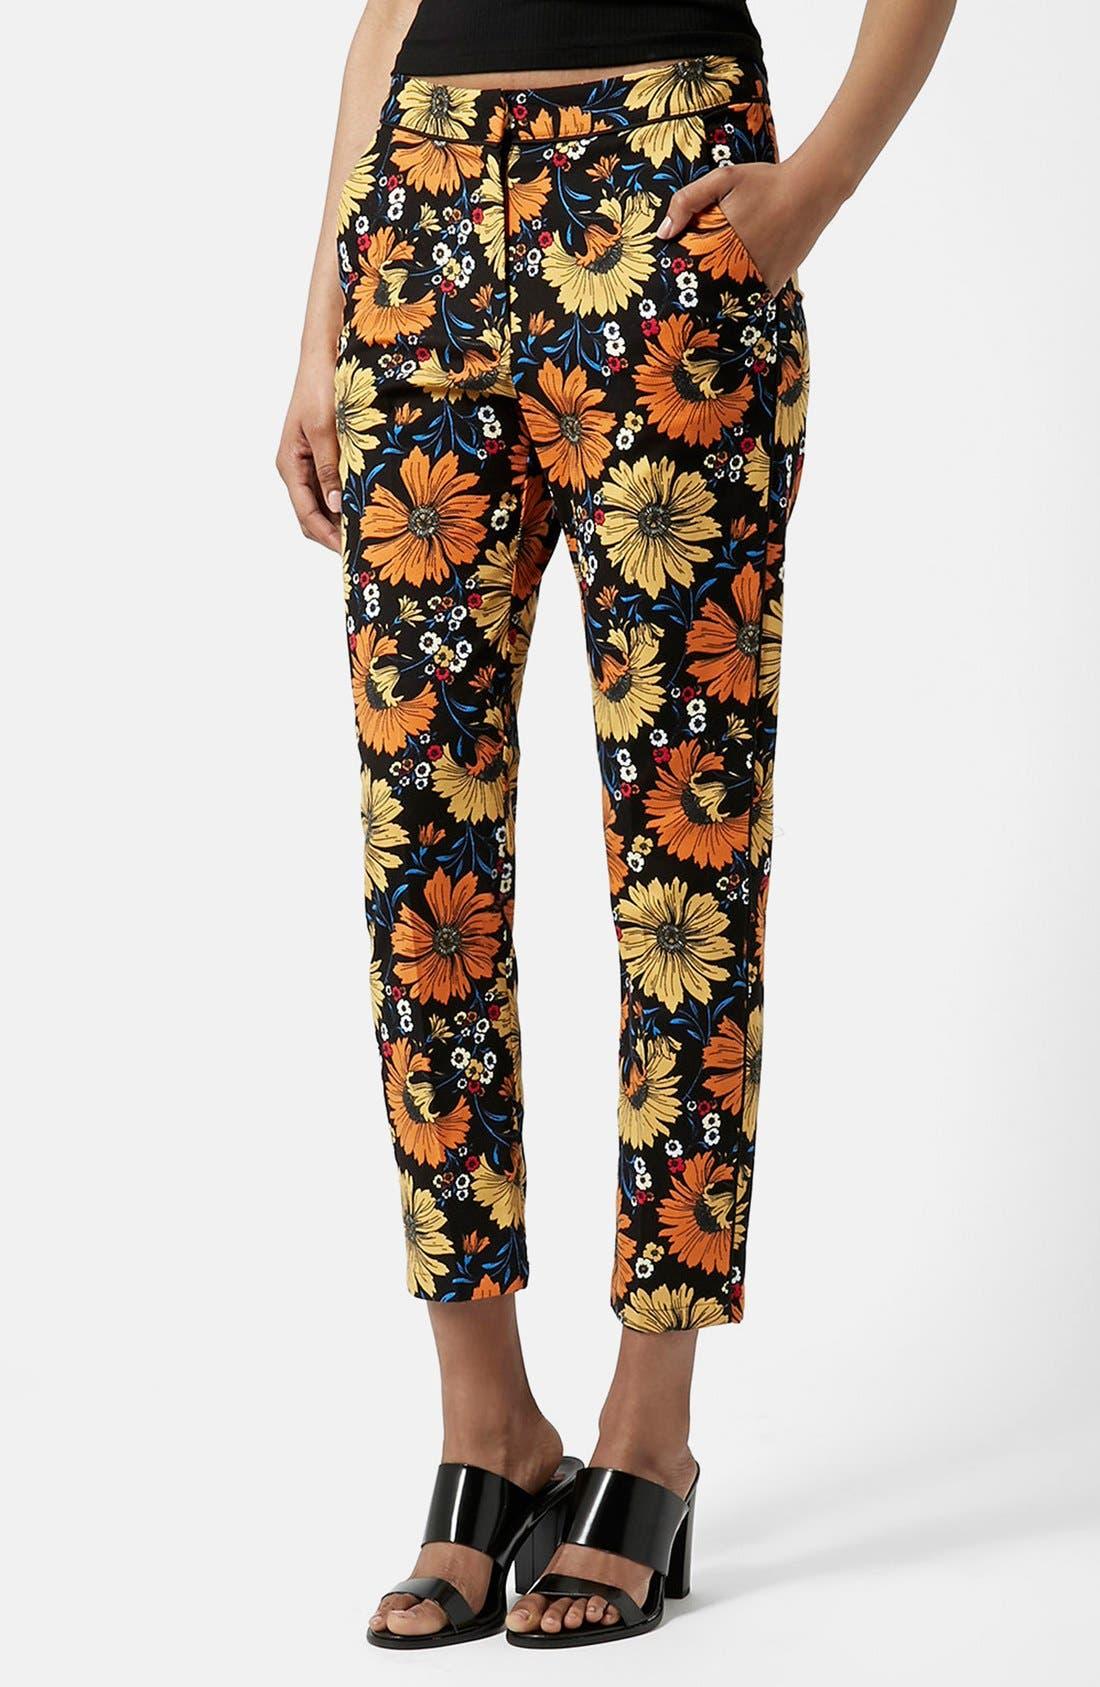 Main Image - Topshop Daisy Print Cigarette Trousers